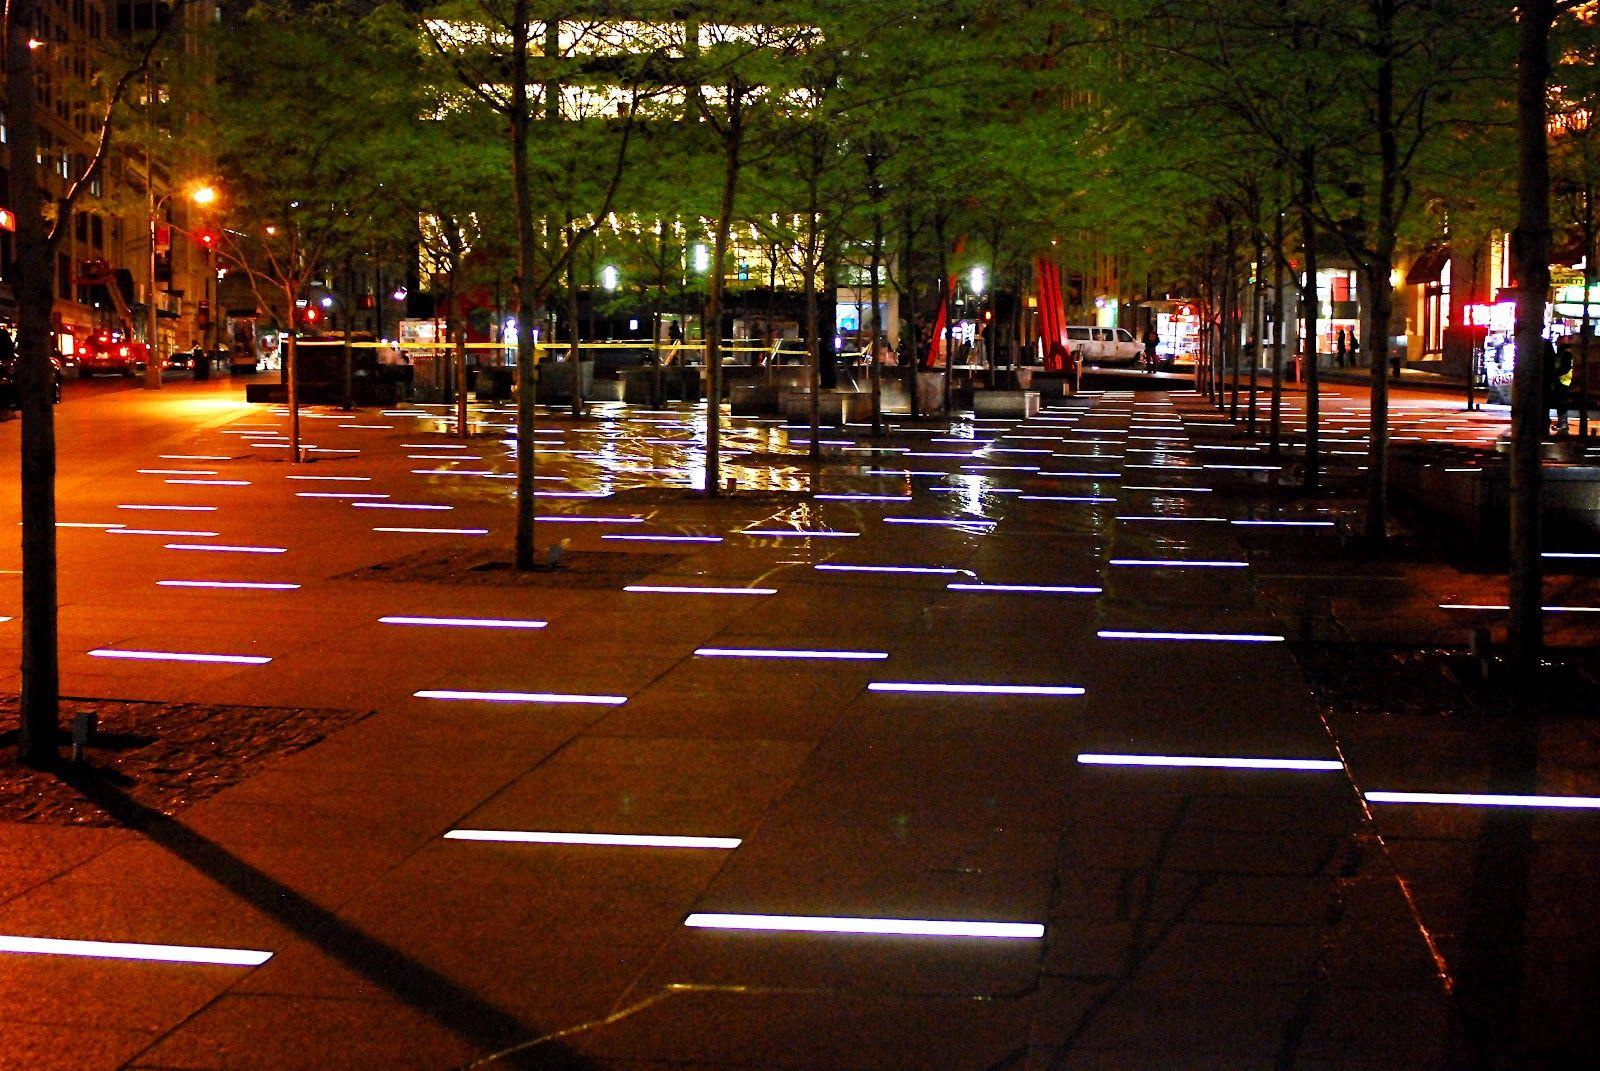 Zuccotti Park New York City Led Strip Paving Lights After Dark Creative Landscape Dark Modern Urban Lighting